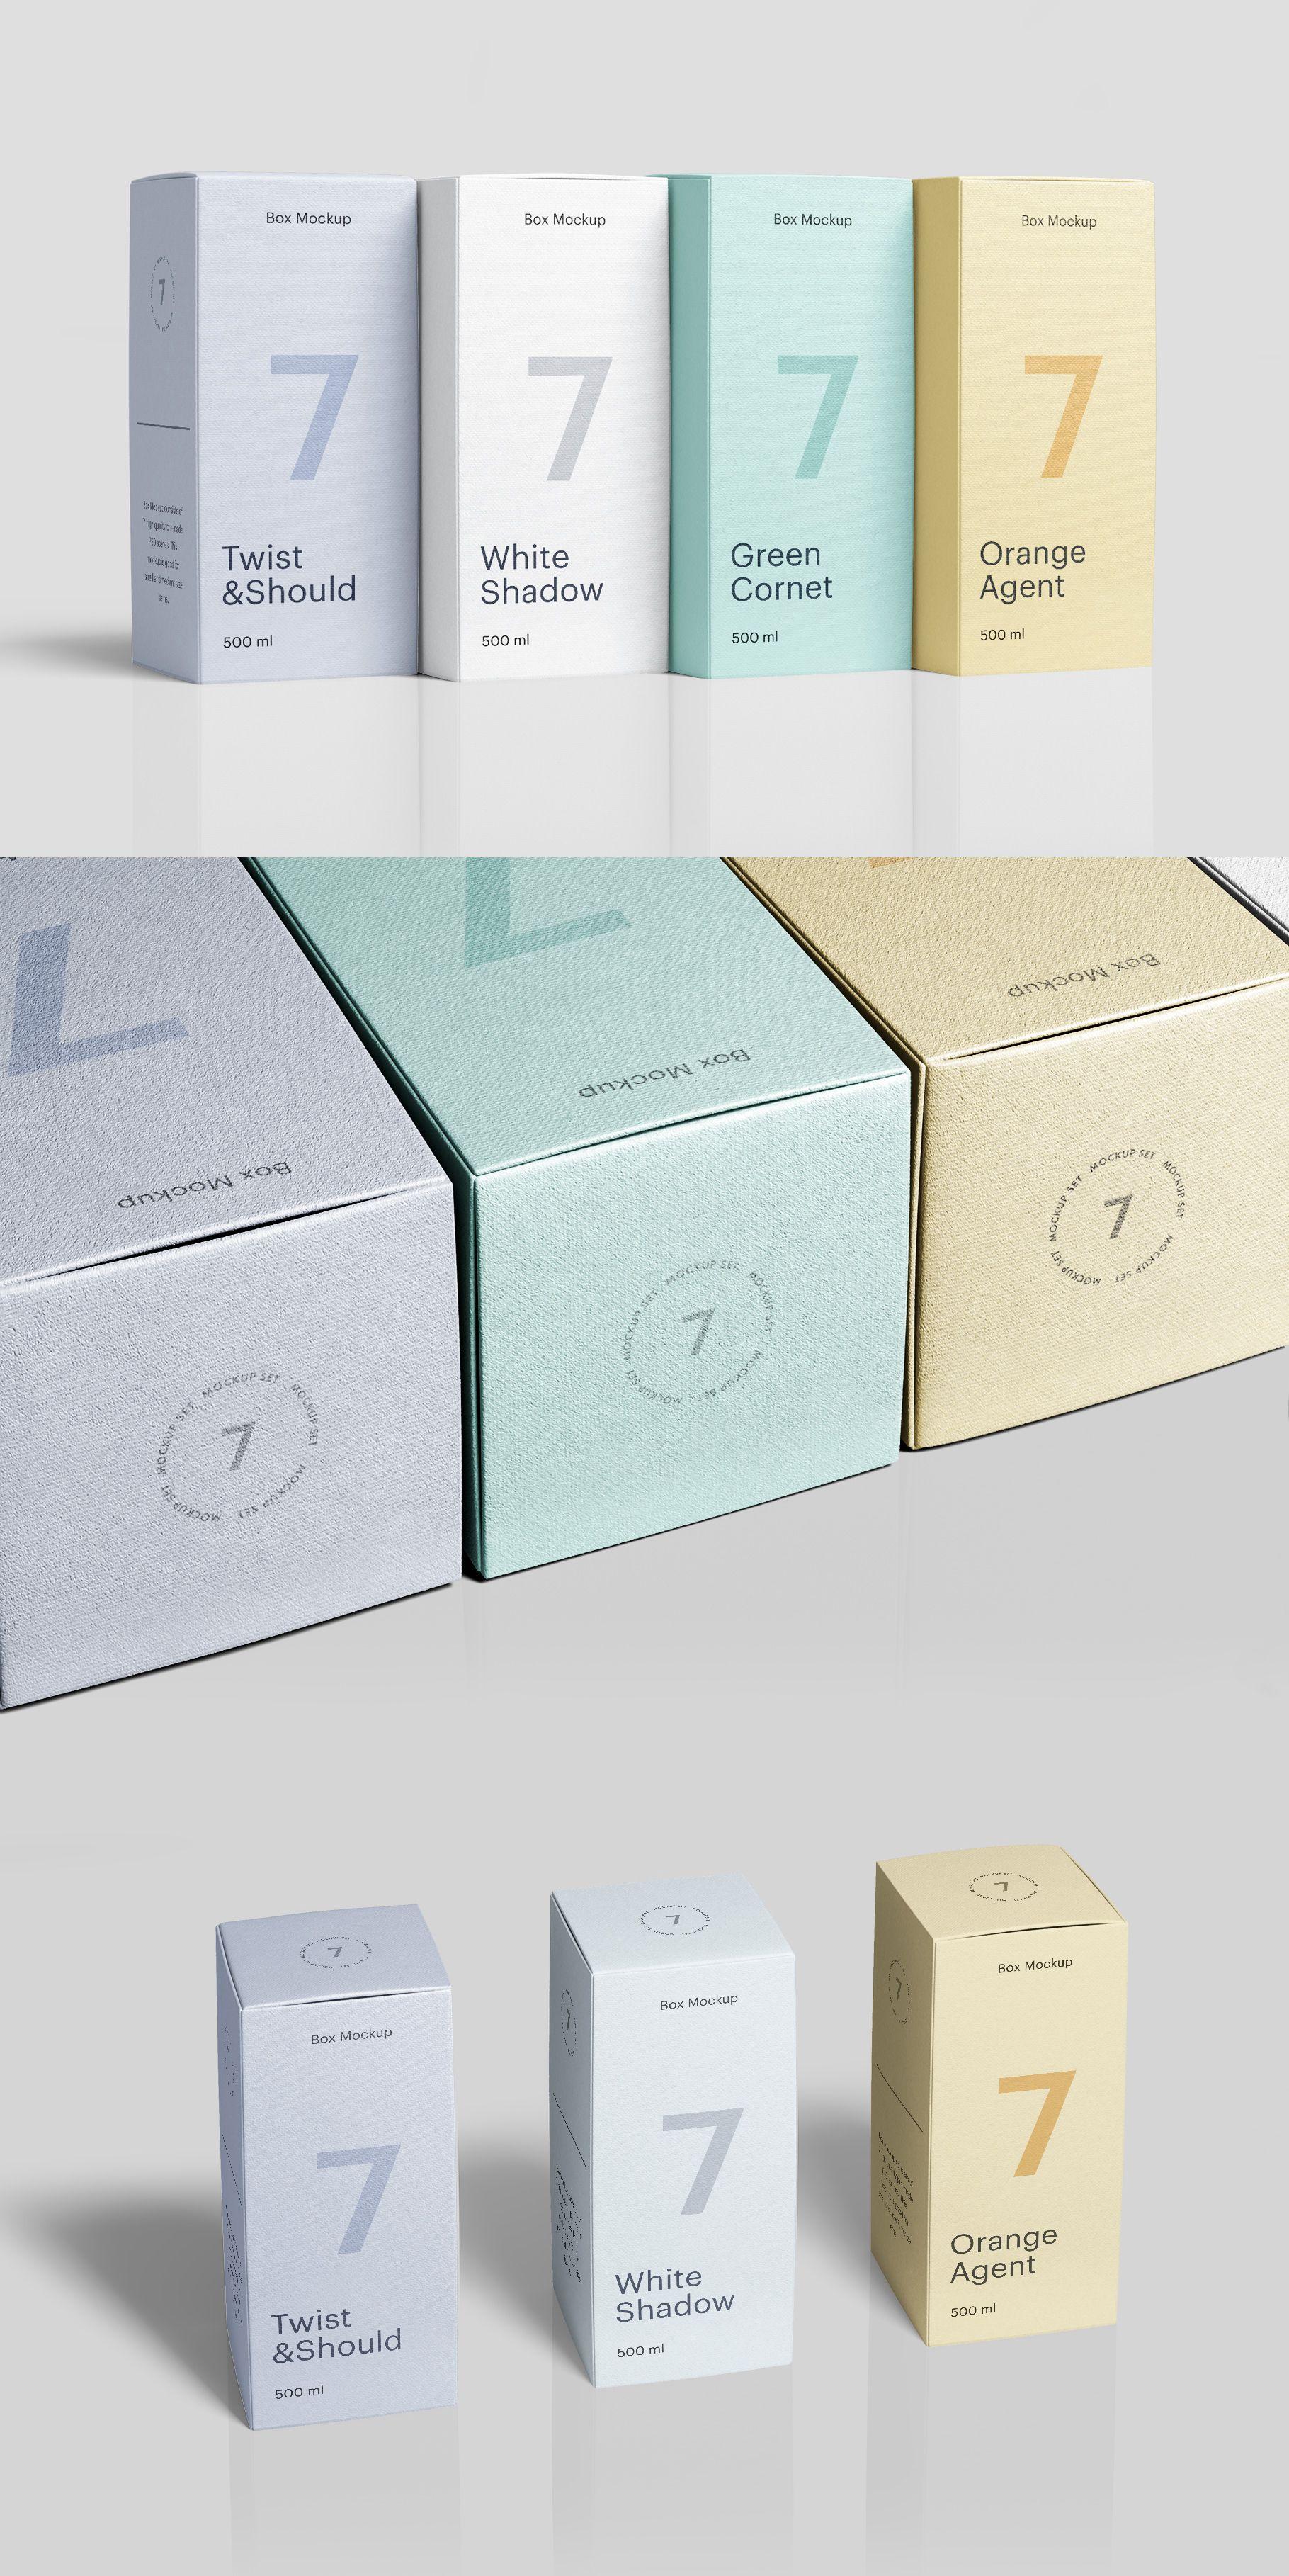 Download Box Mockup Vol 4 Includes 7 Pre Made Psd Scenes This Mockup Is Suitable For Small And Medium Items Like Cosmetics Perfume Box Mockup Perfume Box Bag Mockup